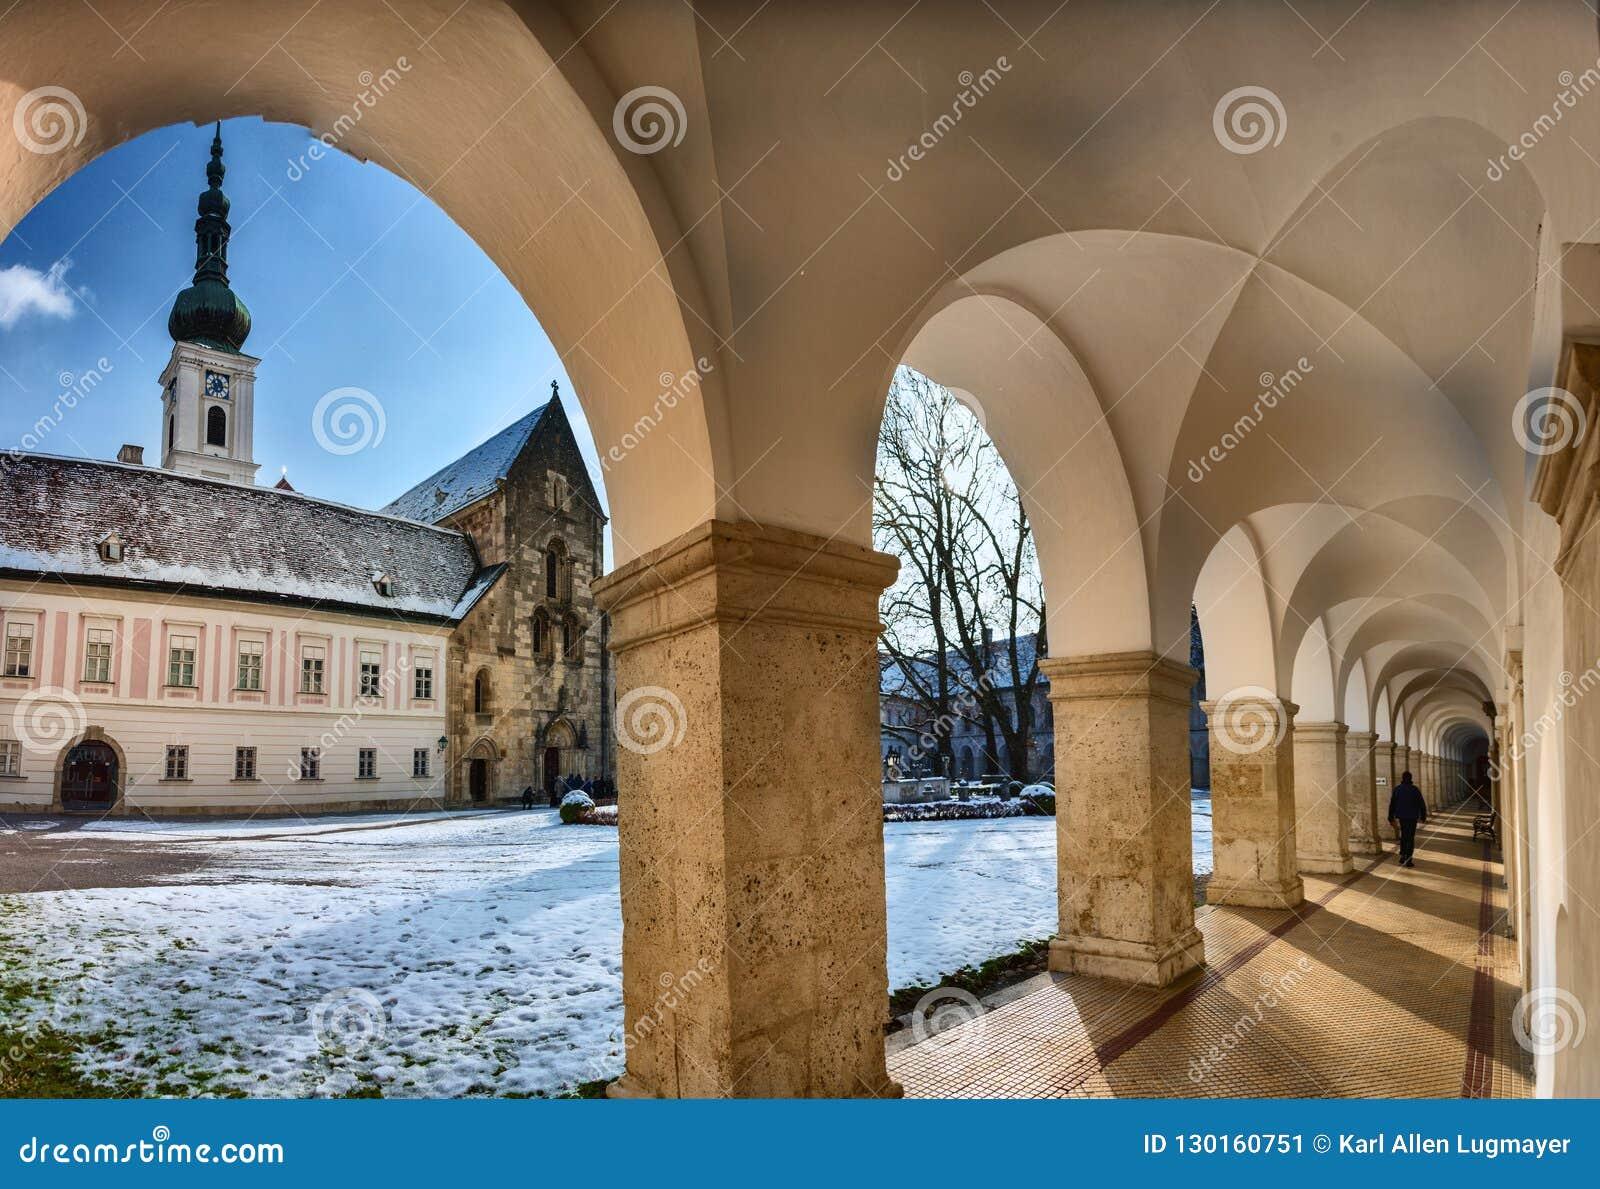 Archway and Inner Yard of the monastery of Heiligenkreuz